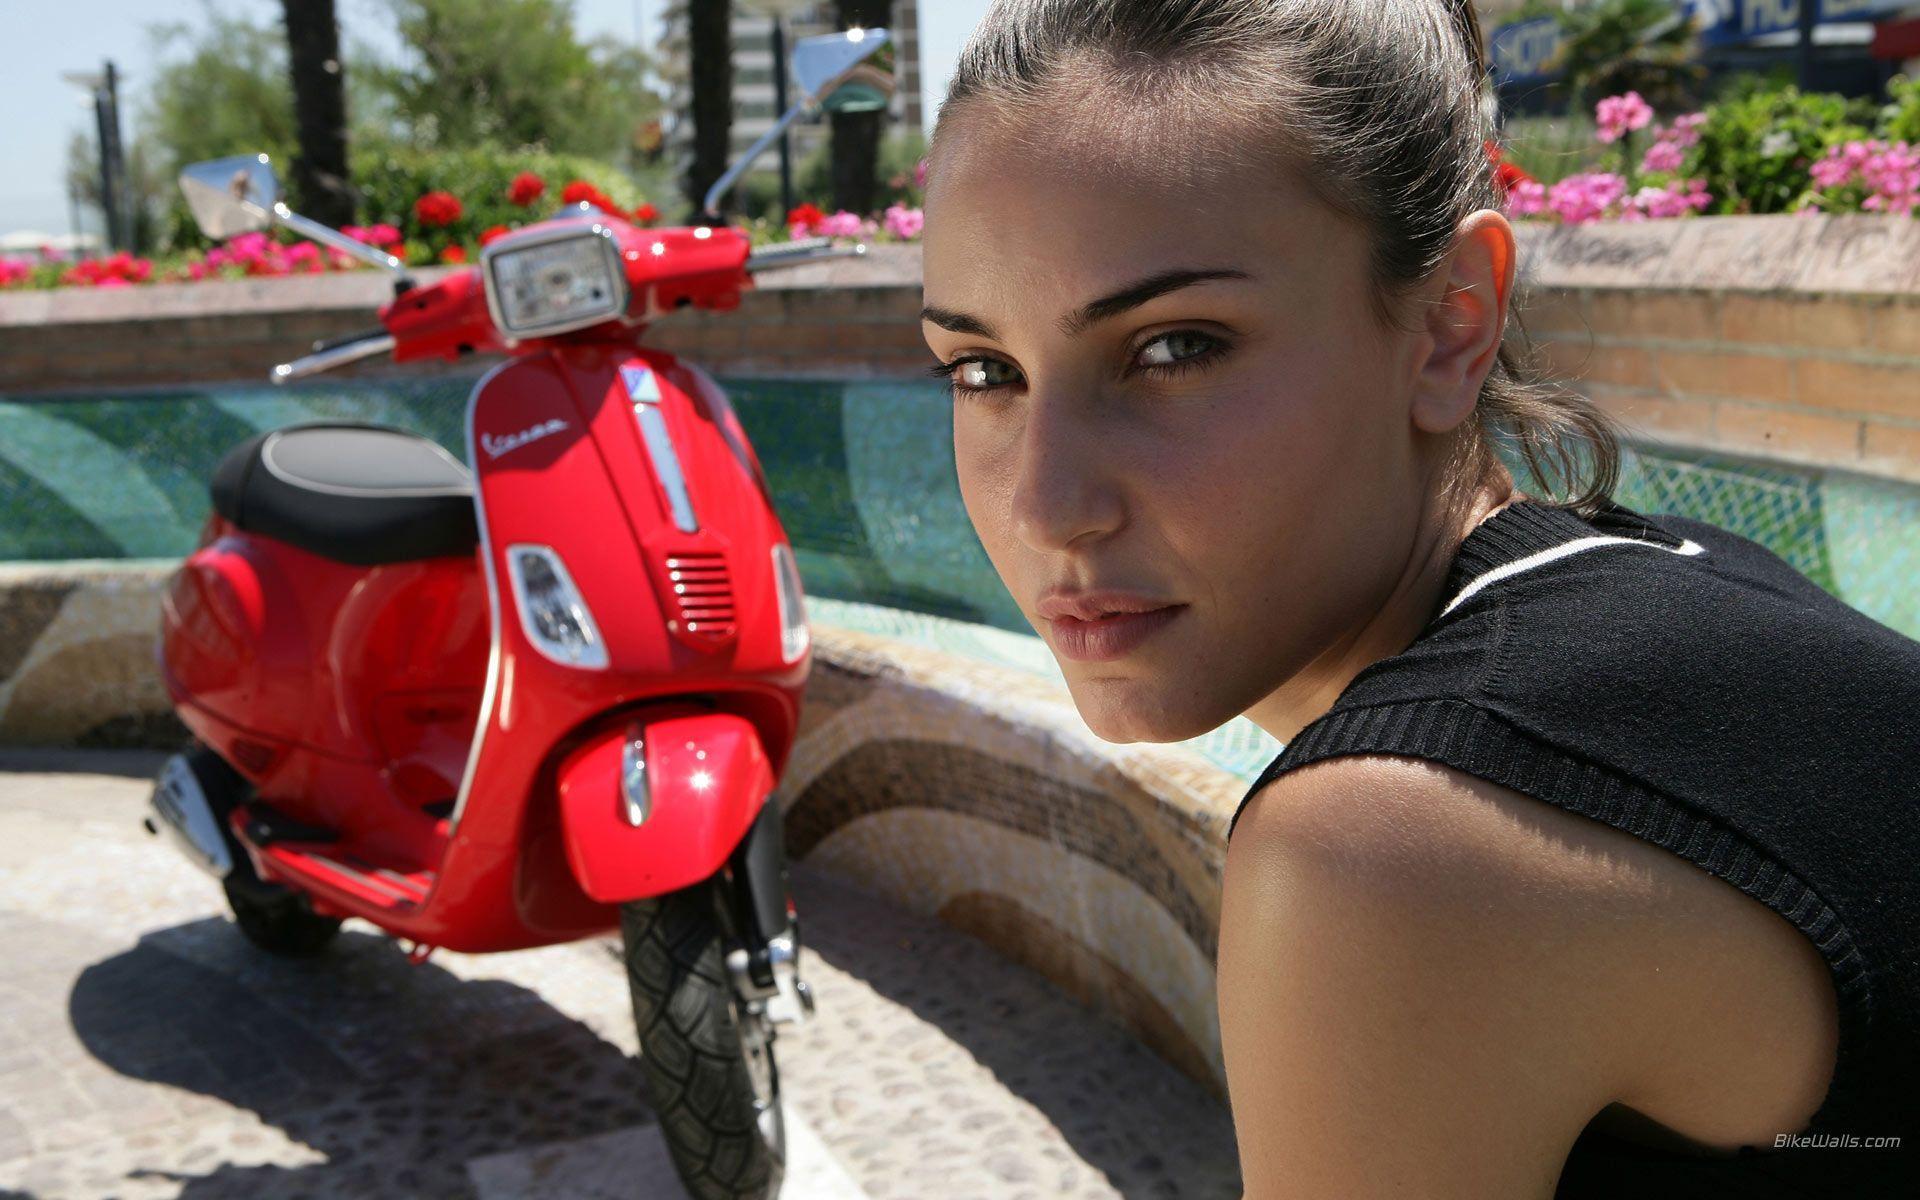 wp5616205-scooter-women-wallpapers.jpg